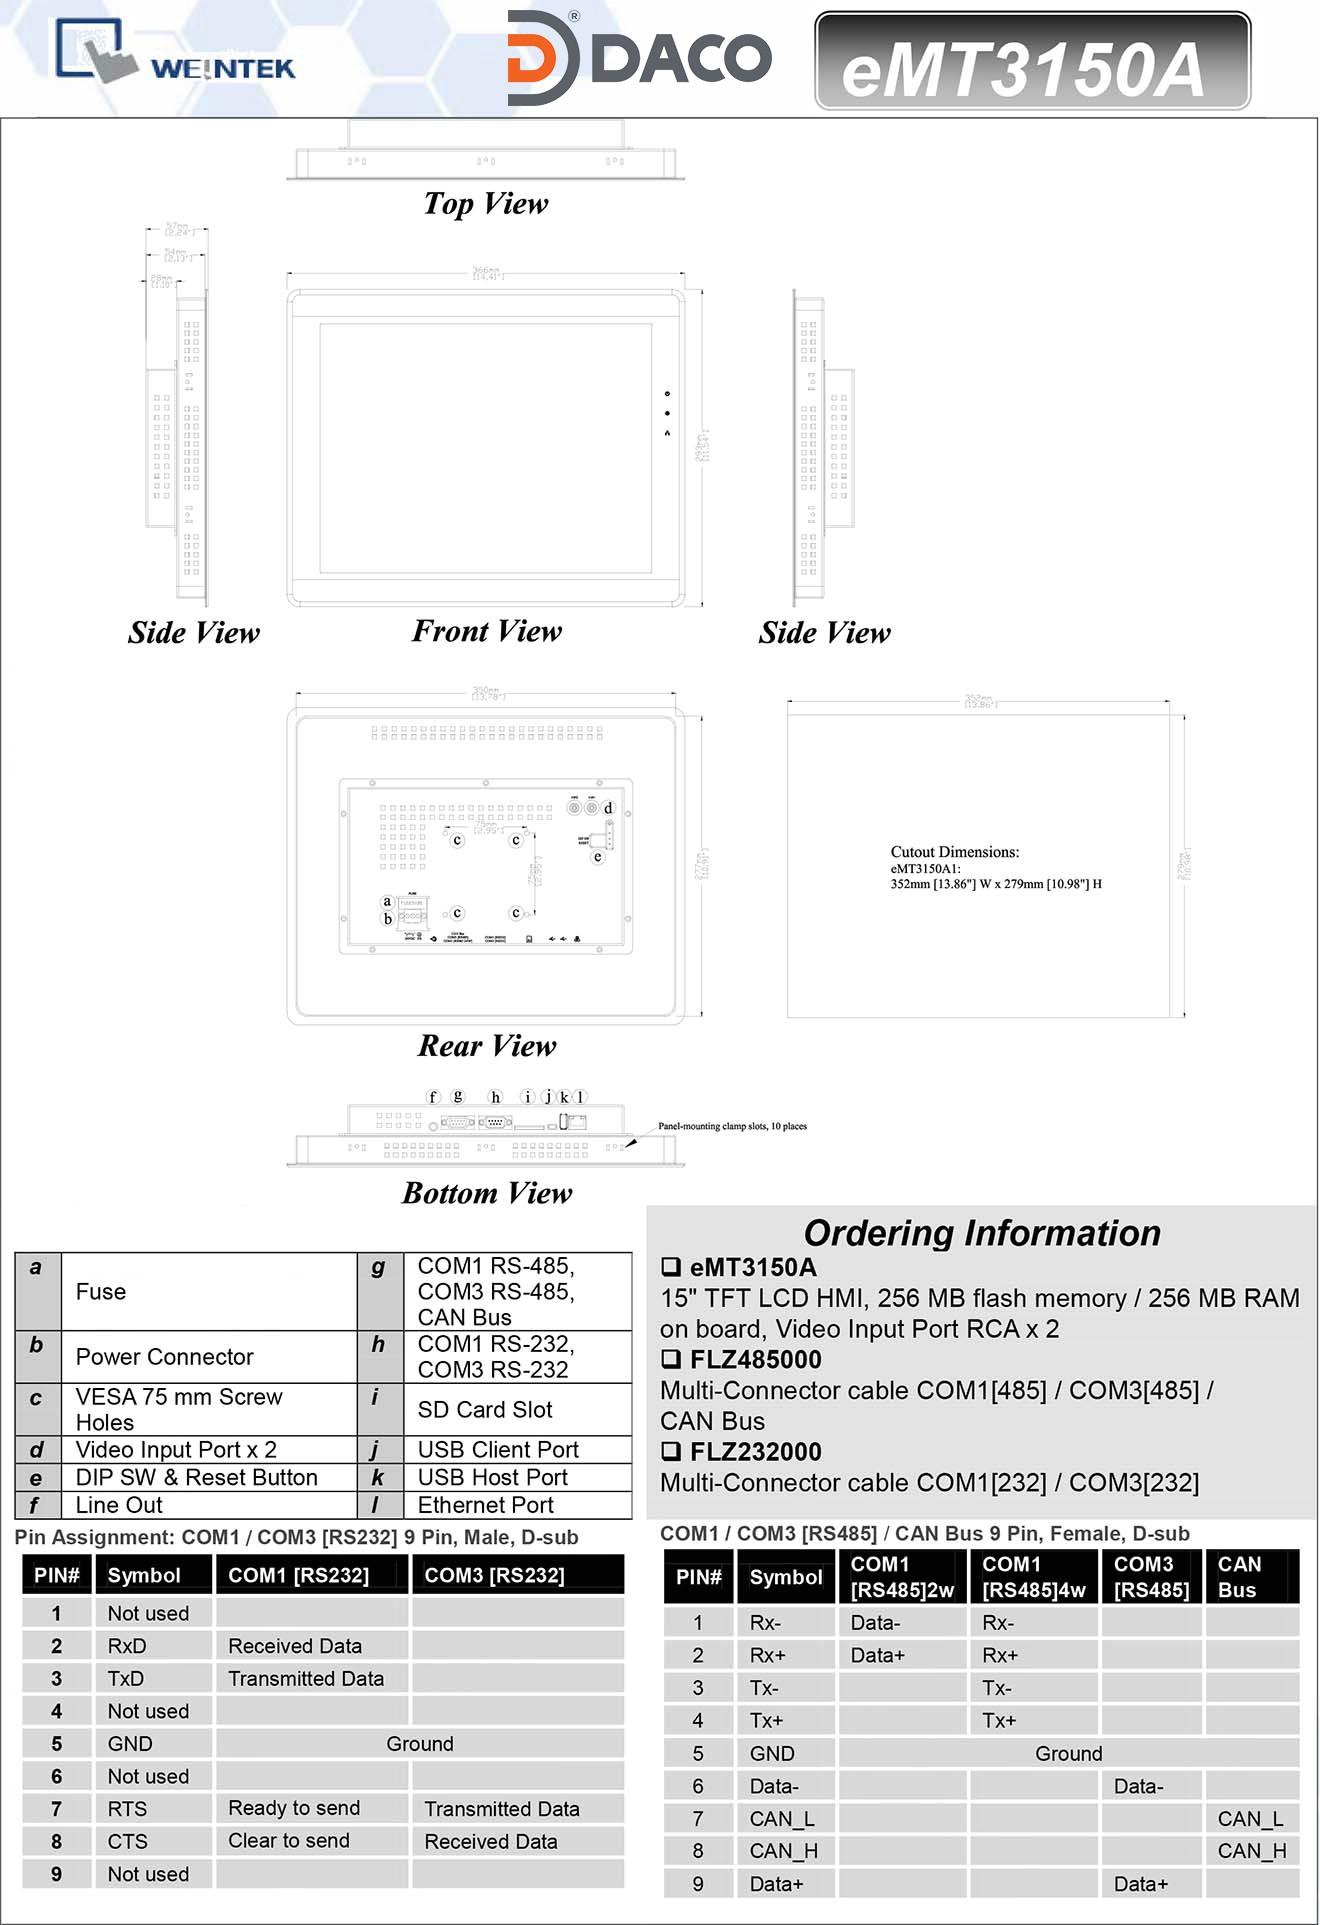 Man hinh cam ung HMI Weintek eMT3150A - 15Inch